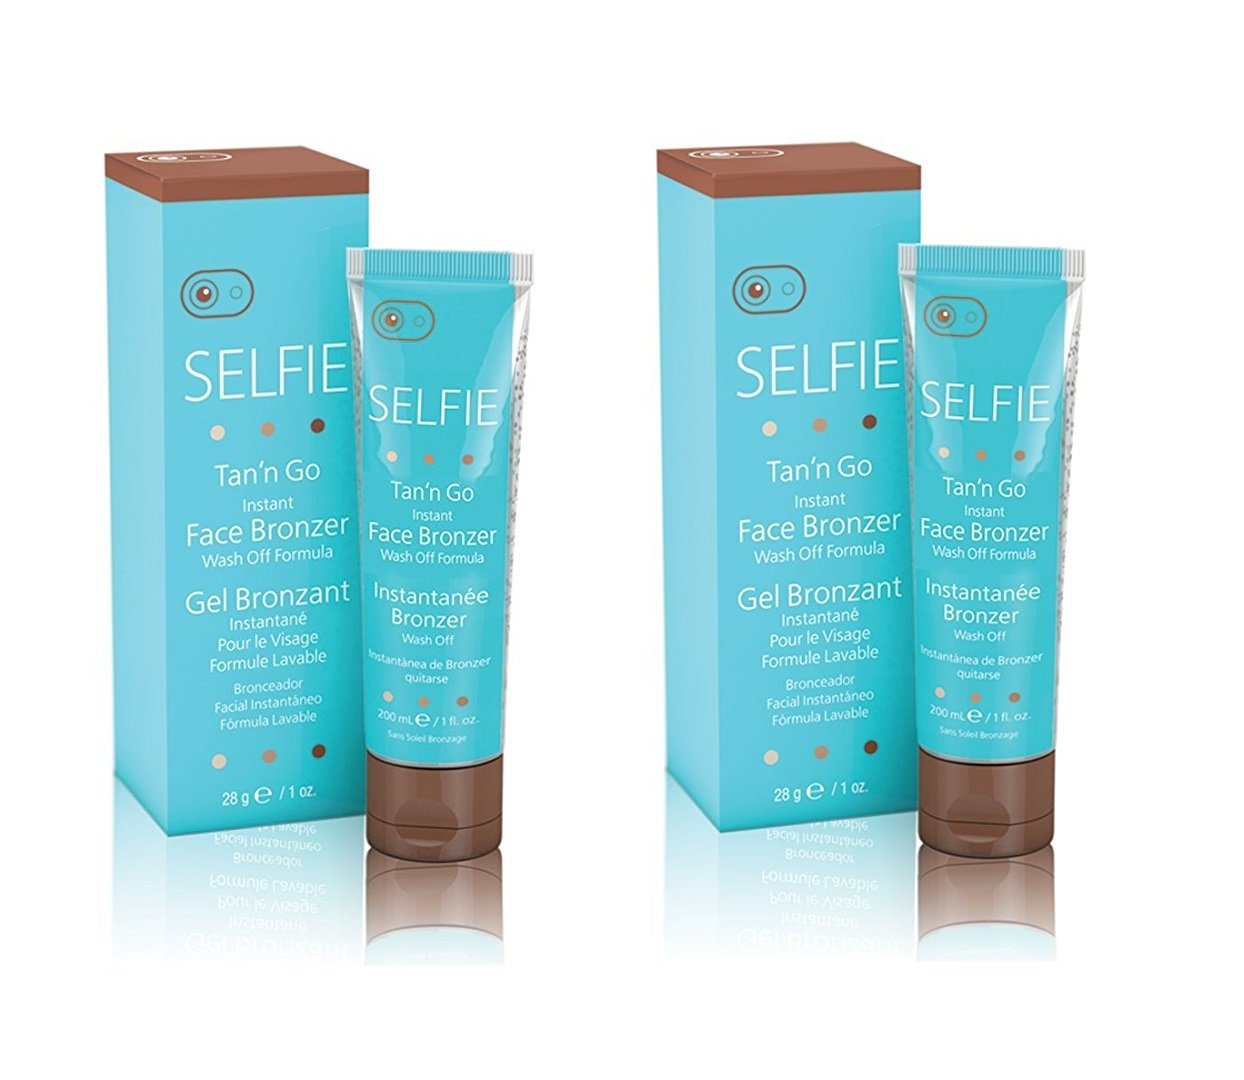 Selfie Tan'n Go Instant Face Bronzer, Wash Off Formula, Medium Tan, 1 Oz (Pack of 2) + FREE Old Spice Deadlock Spiking Glue, Travel Size, .84 Oz